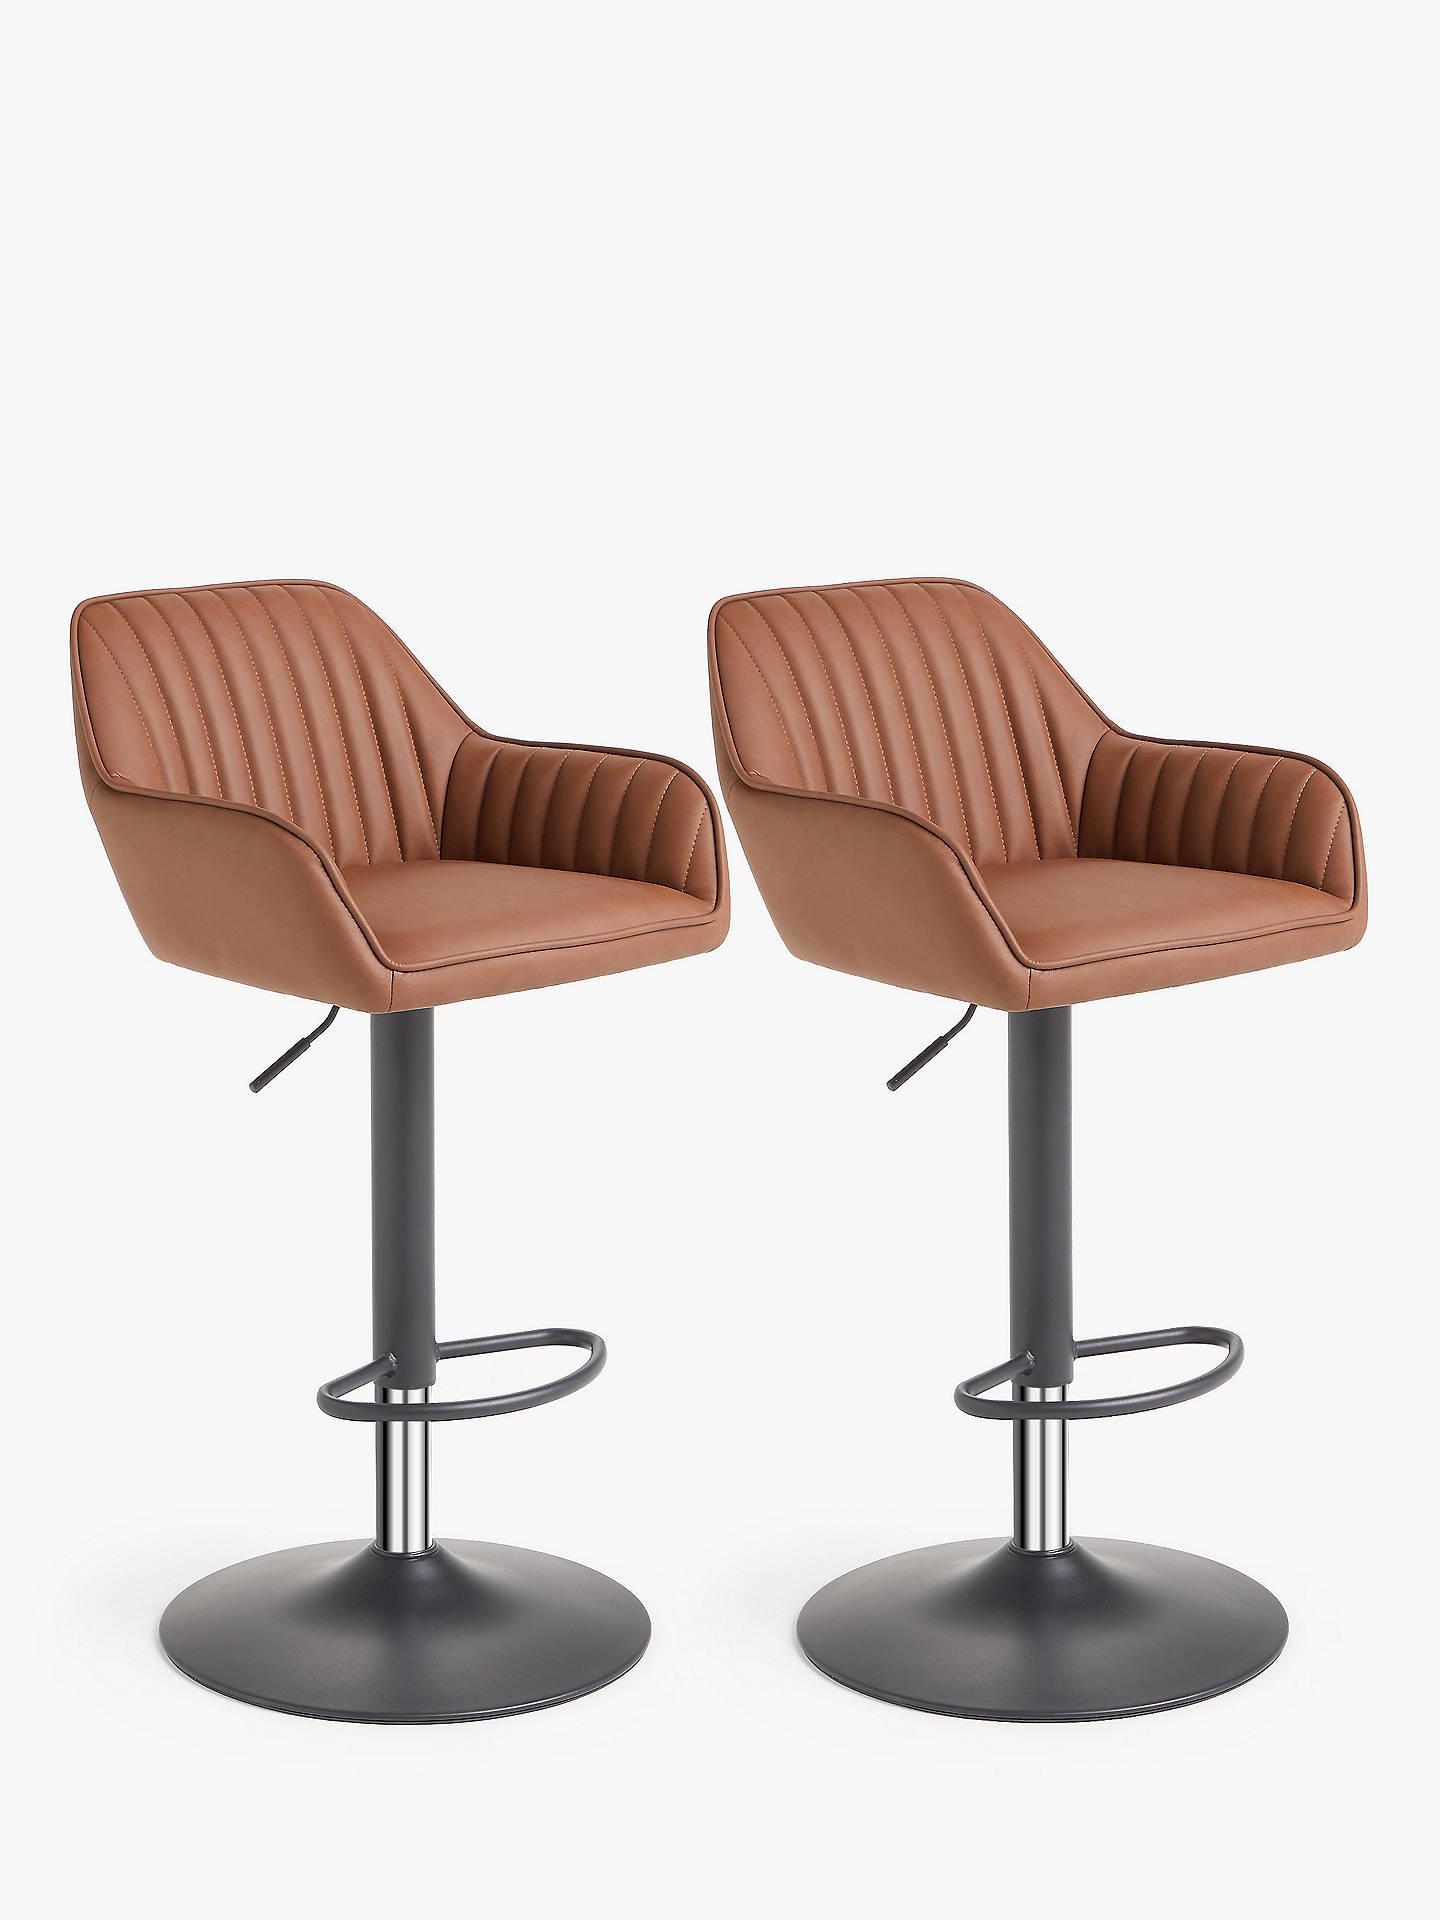 John Lewis & Partners Brooks Gas Lift Adjustable Bar Chairs, Set of 8, Tan